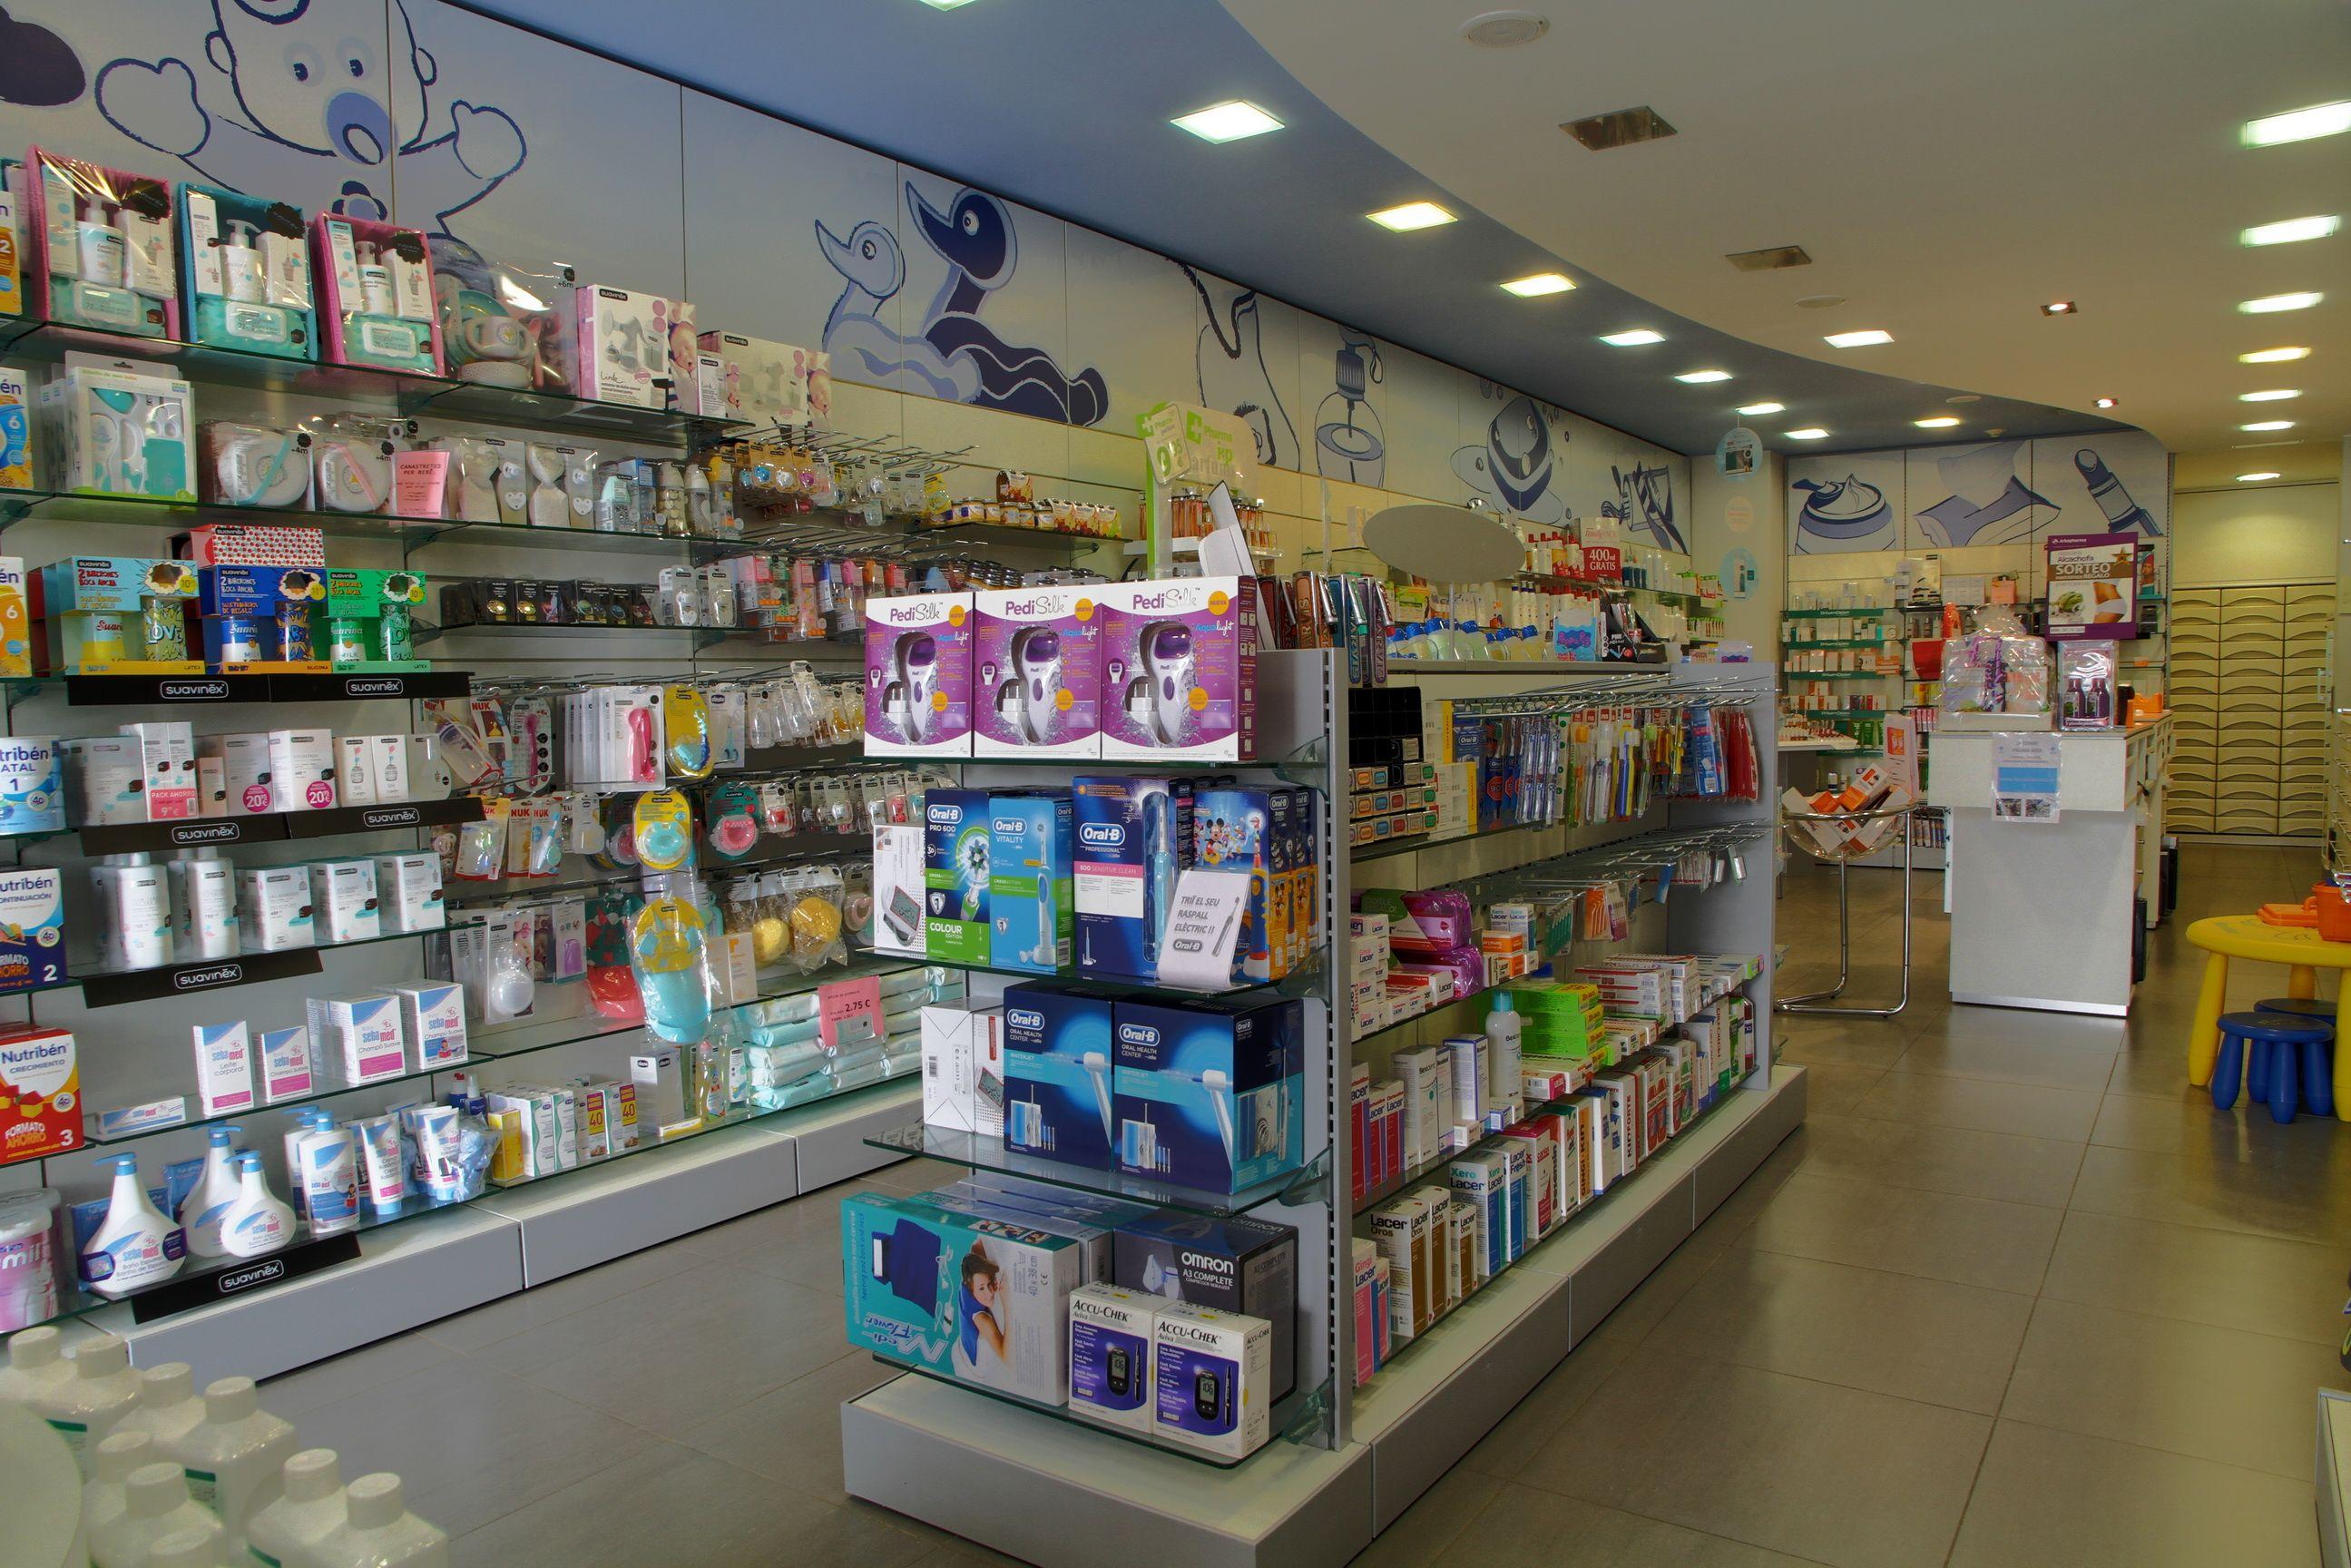 Foto 5 de Farmacia en Guissona   Farmacia Rosa Cinca